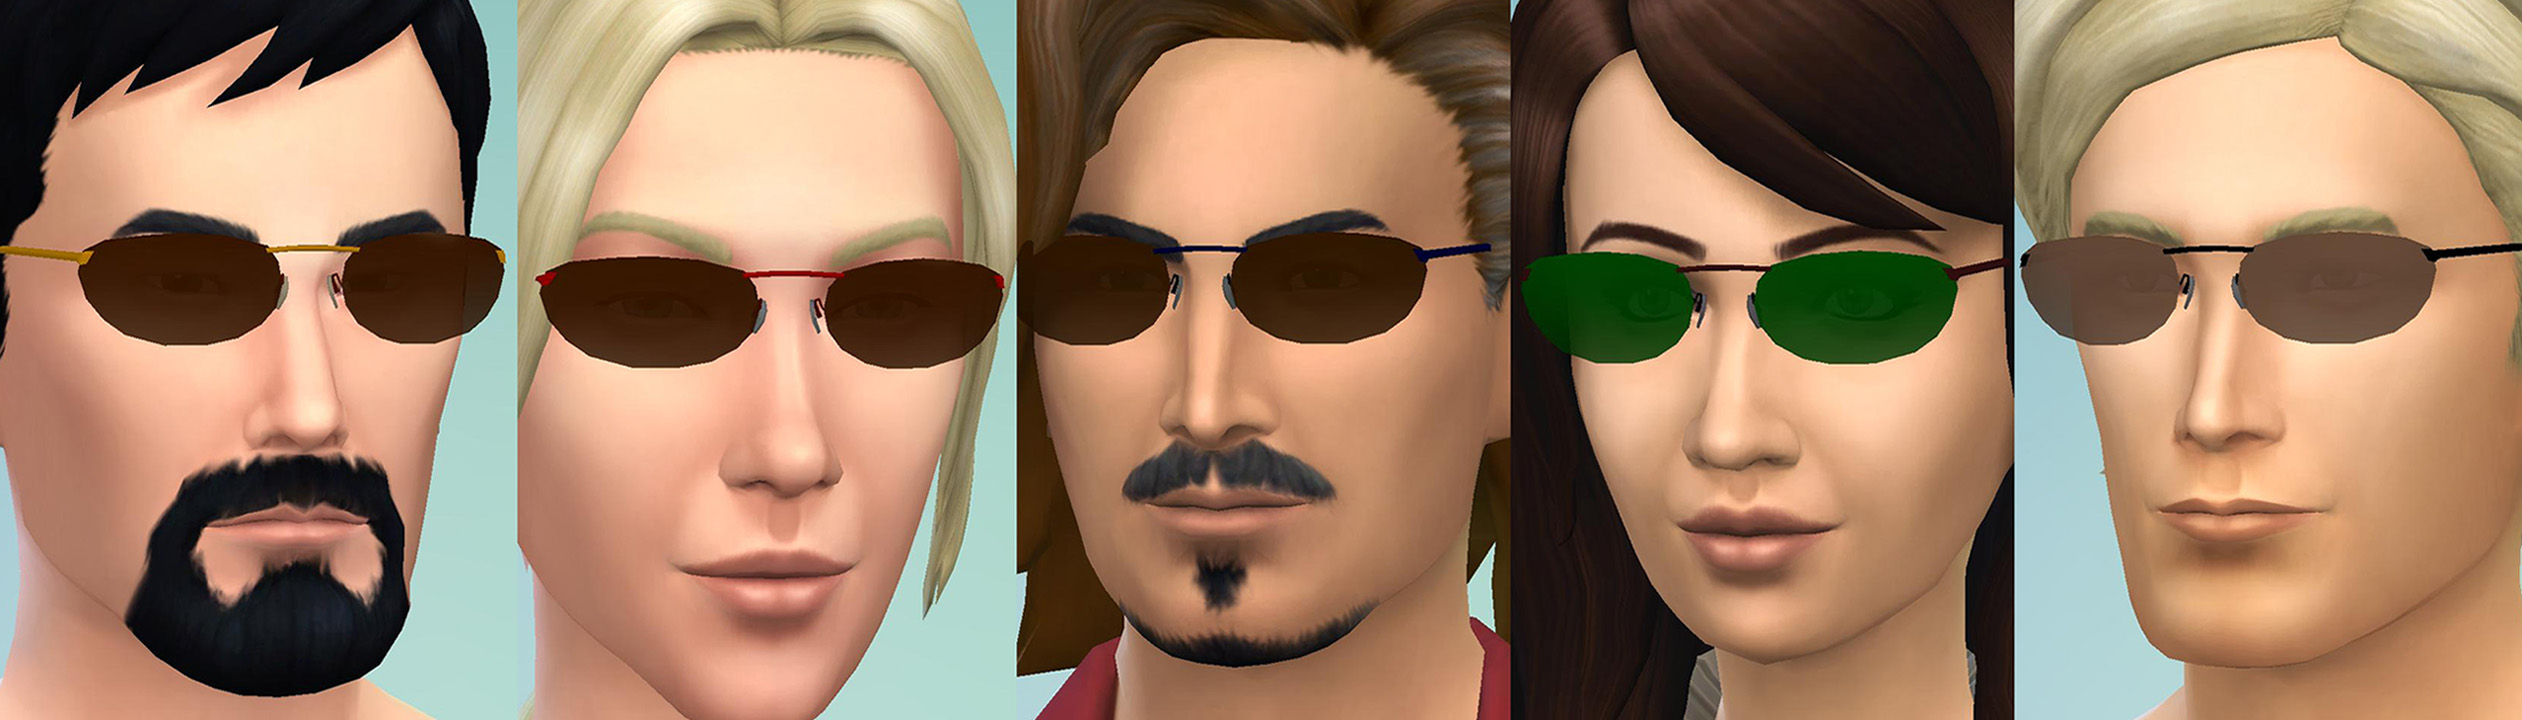 d805d2efde Mod The Sims - Matrix-ish Sunglasses  UPDATE March 2 2016 - Closer fit